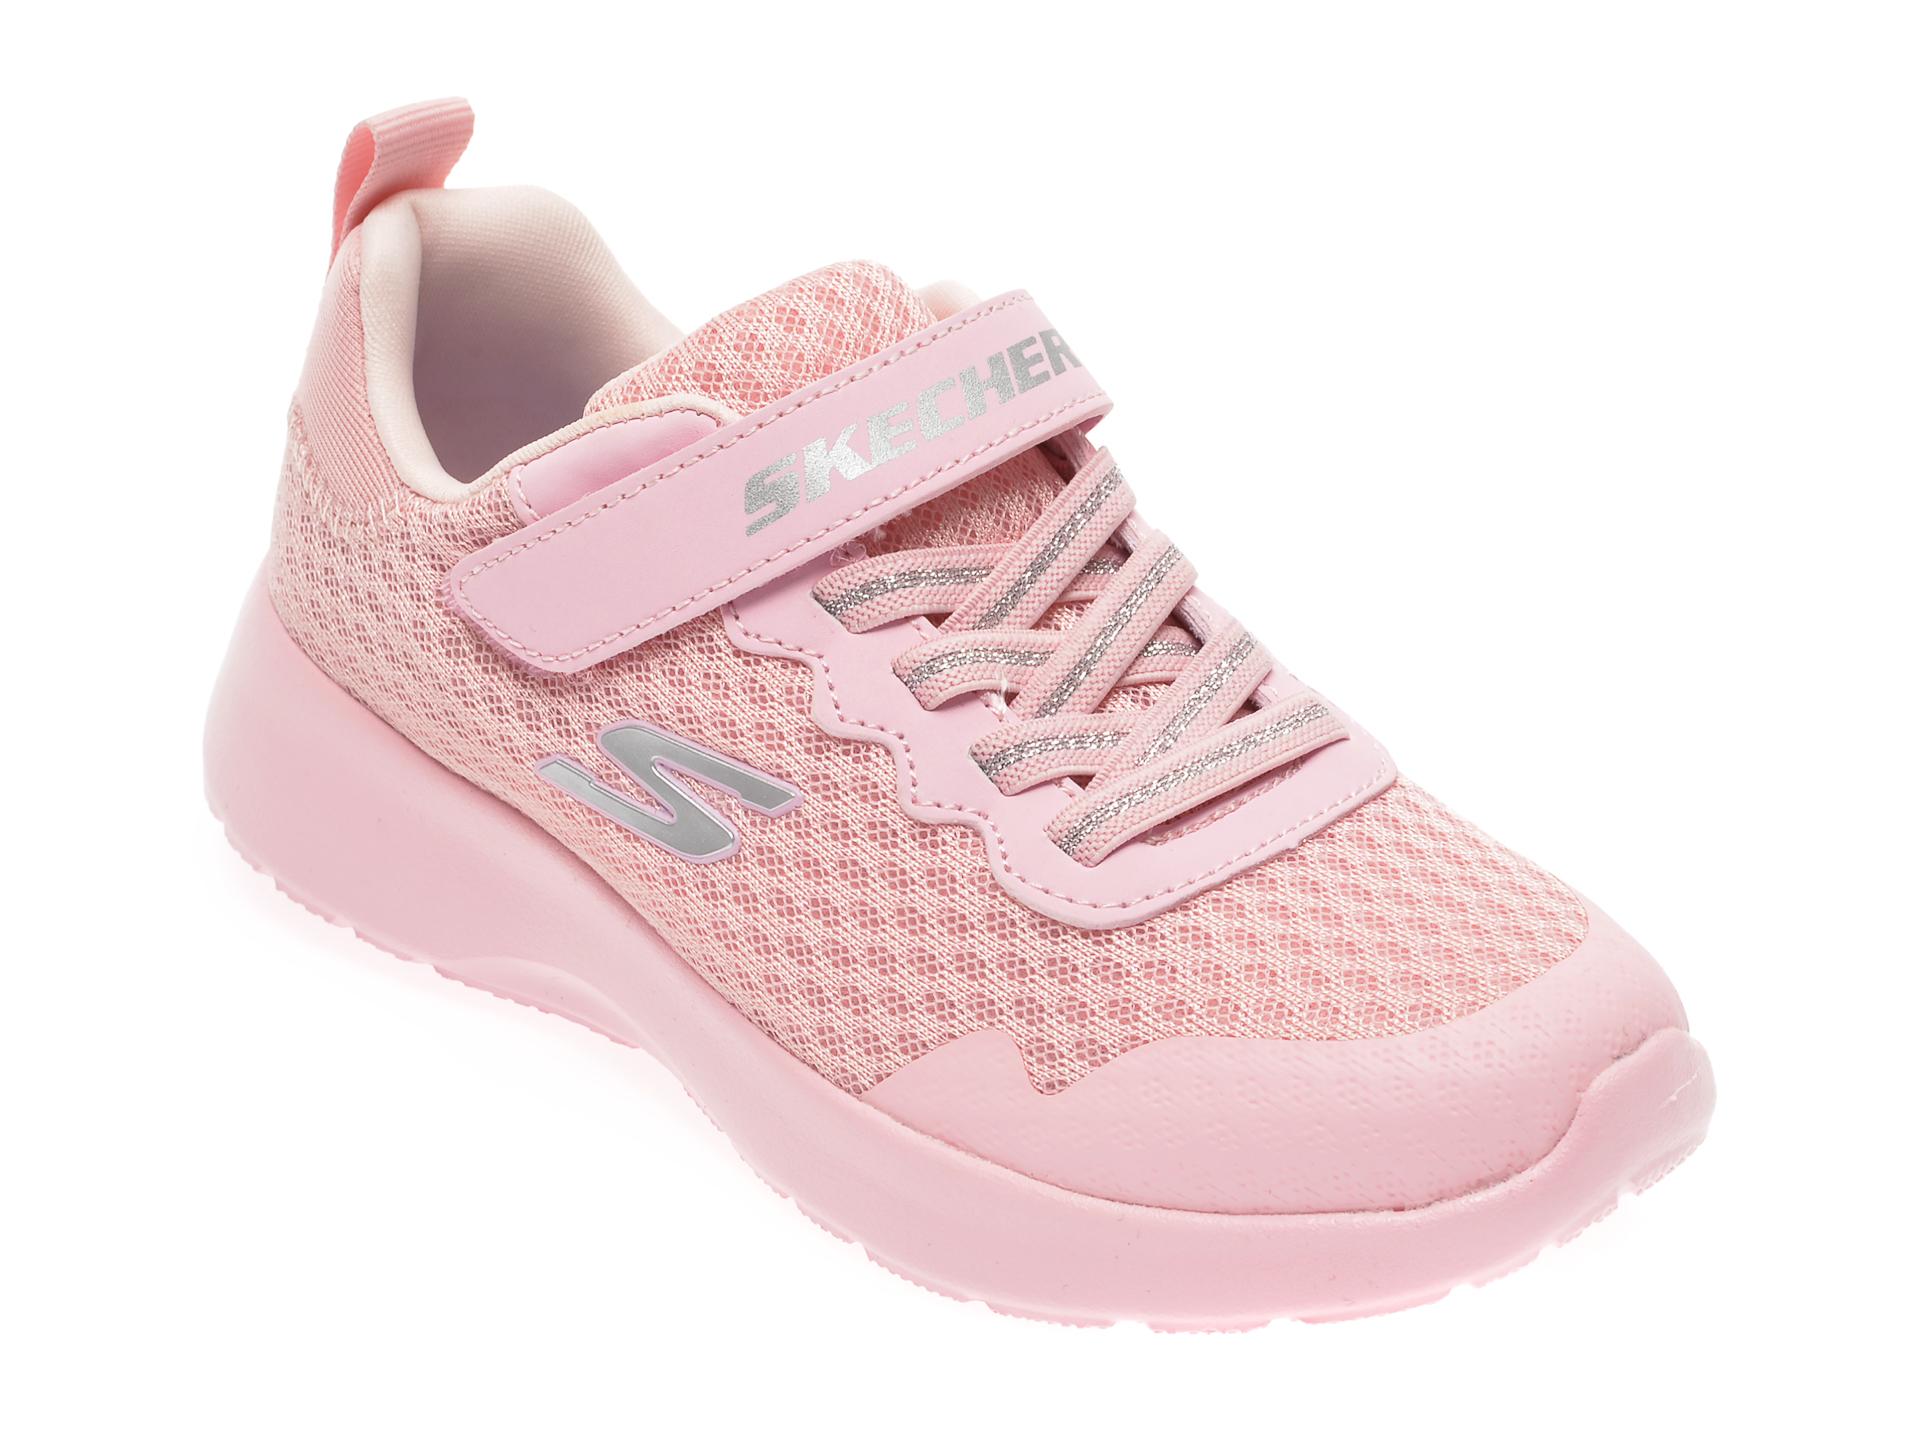 Pantofi sport SKECHERS roz, Dynamight Lead Runner, din material textil New